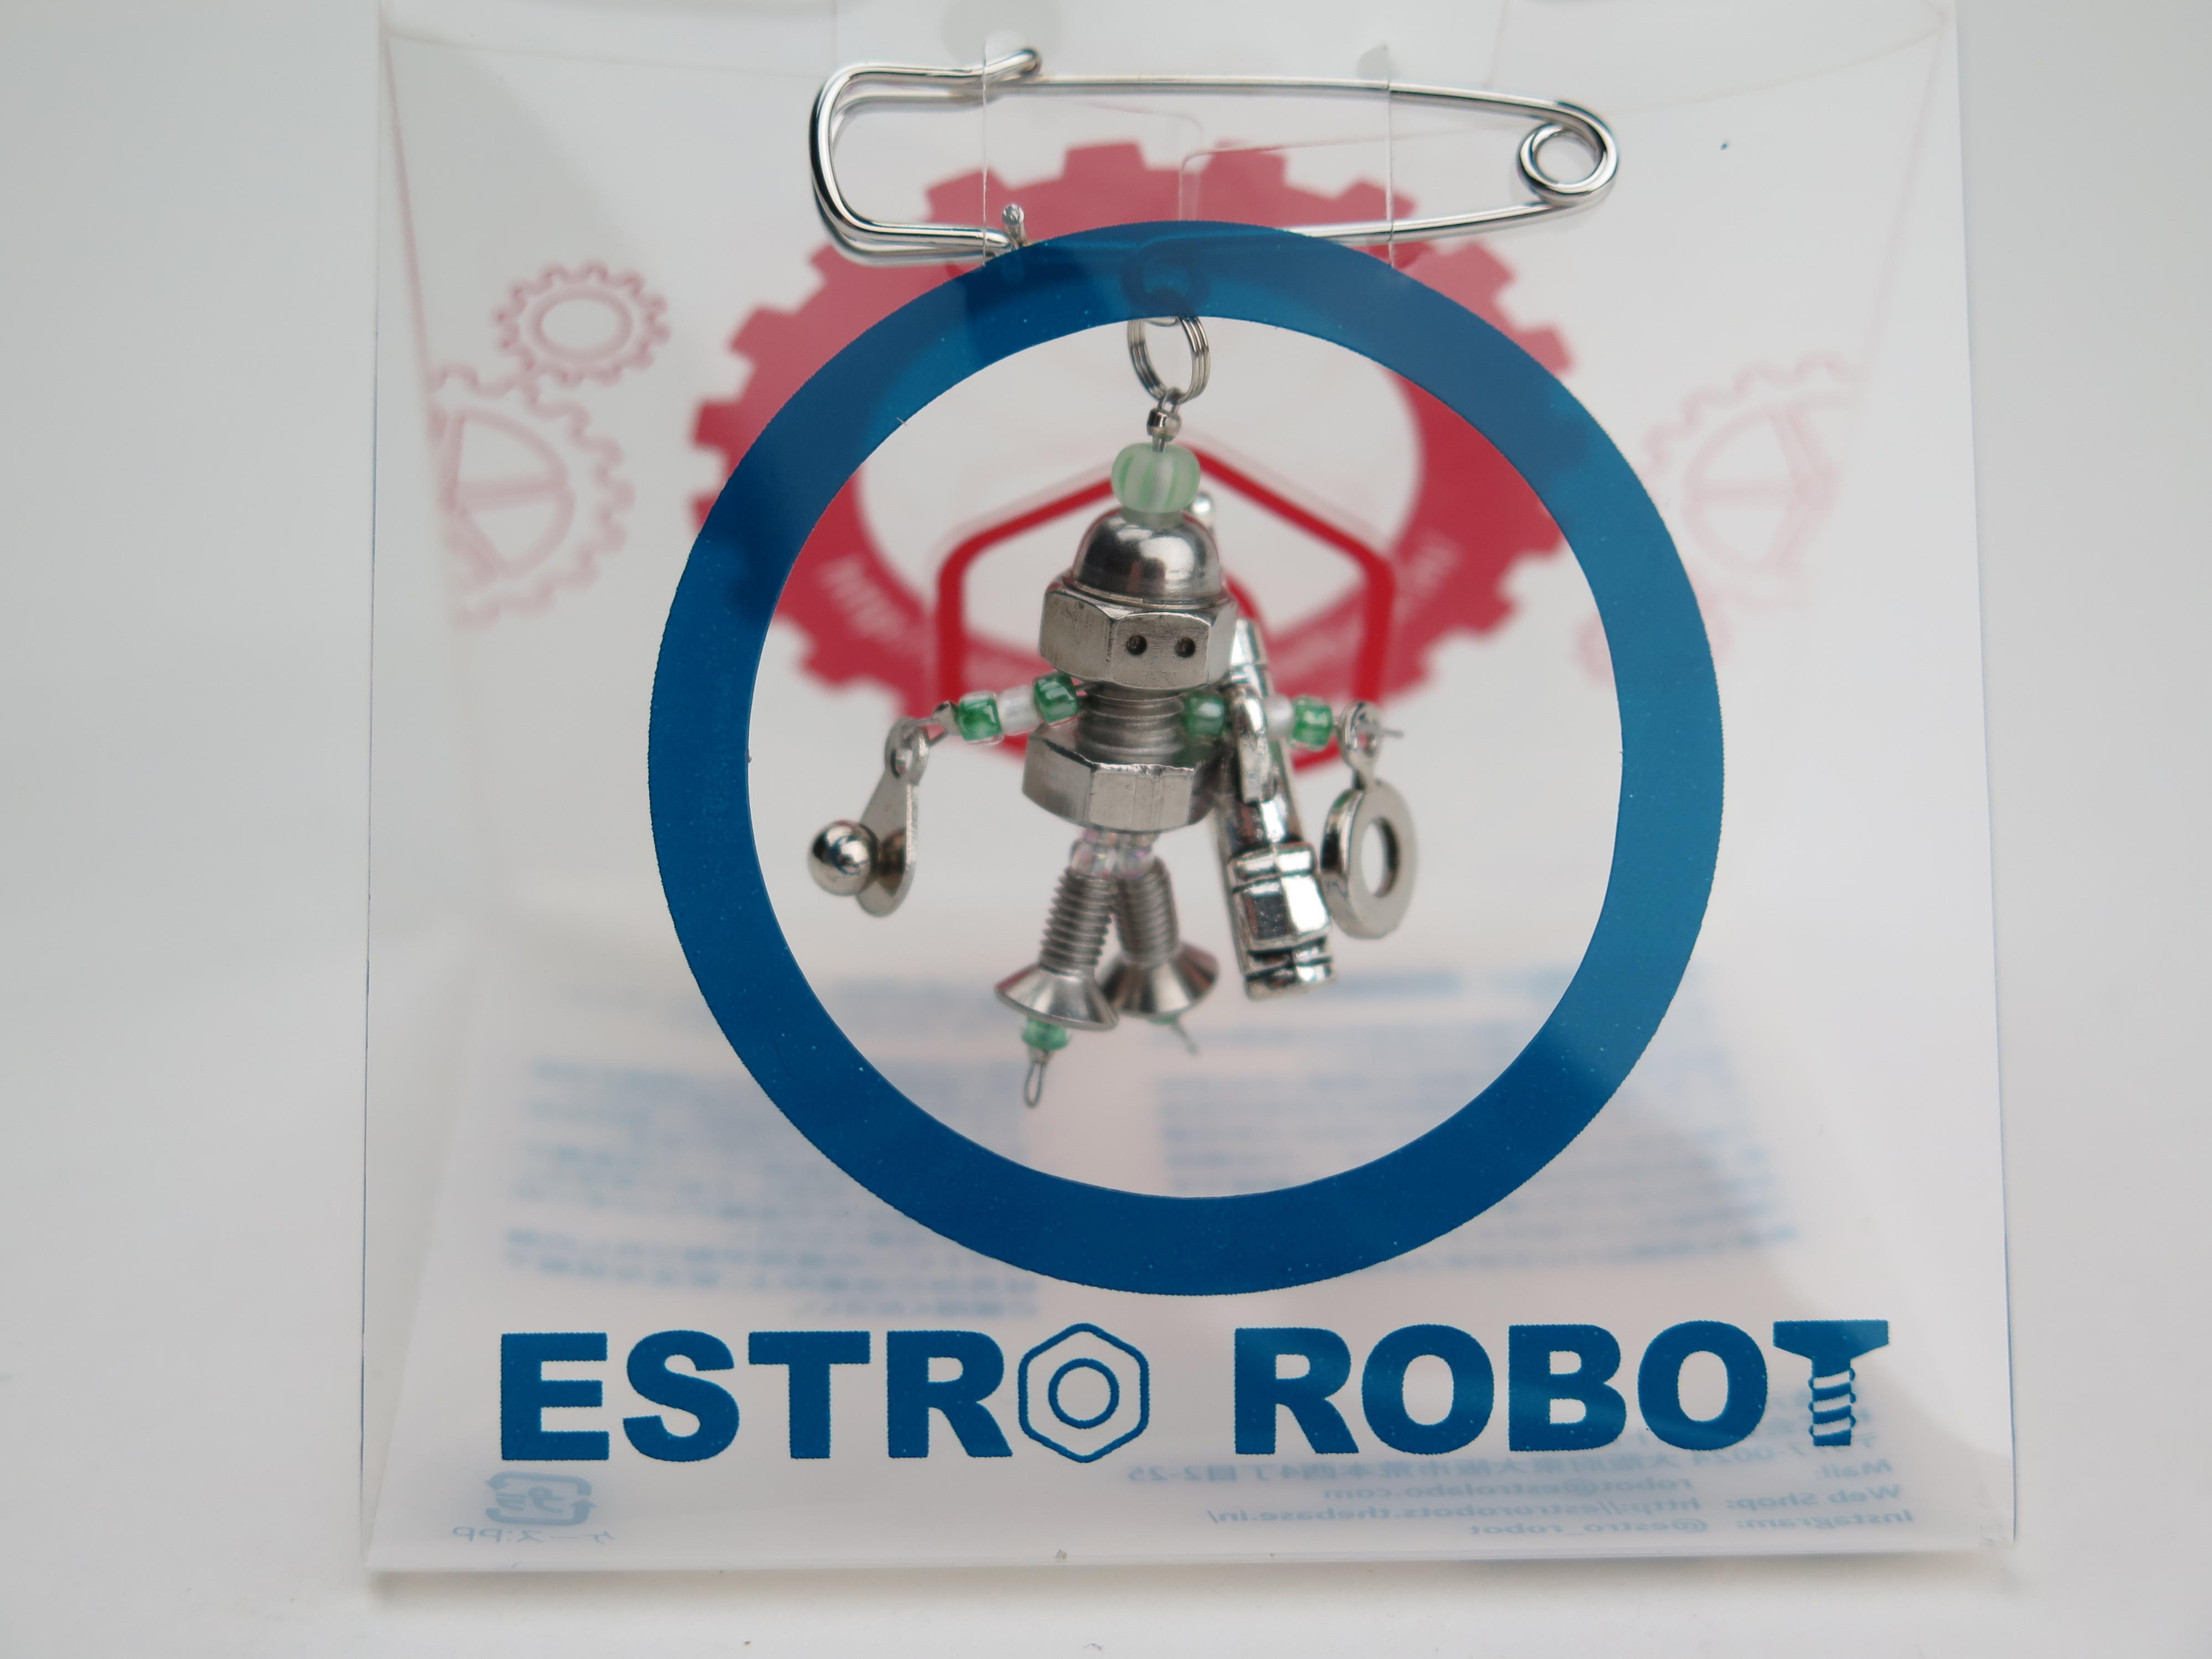 estro robot golf green ゴルフ グリーン